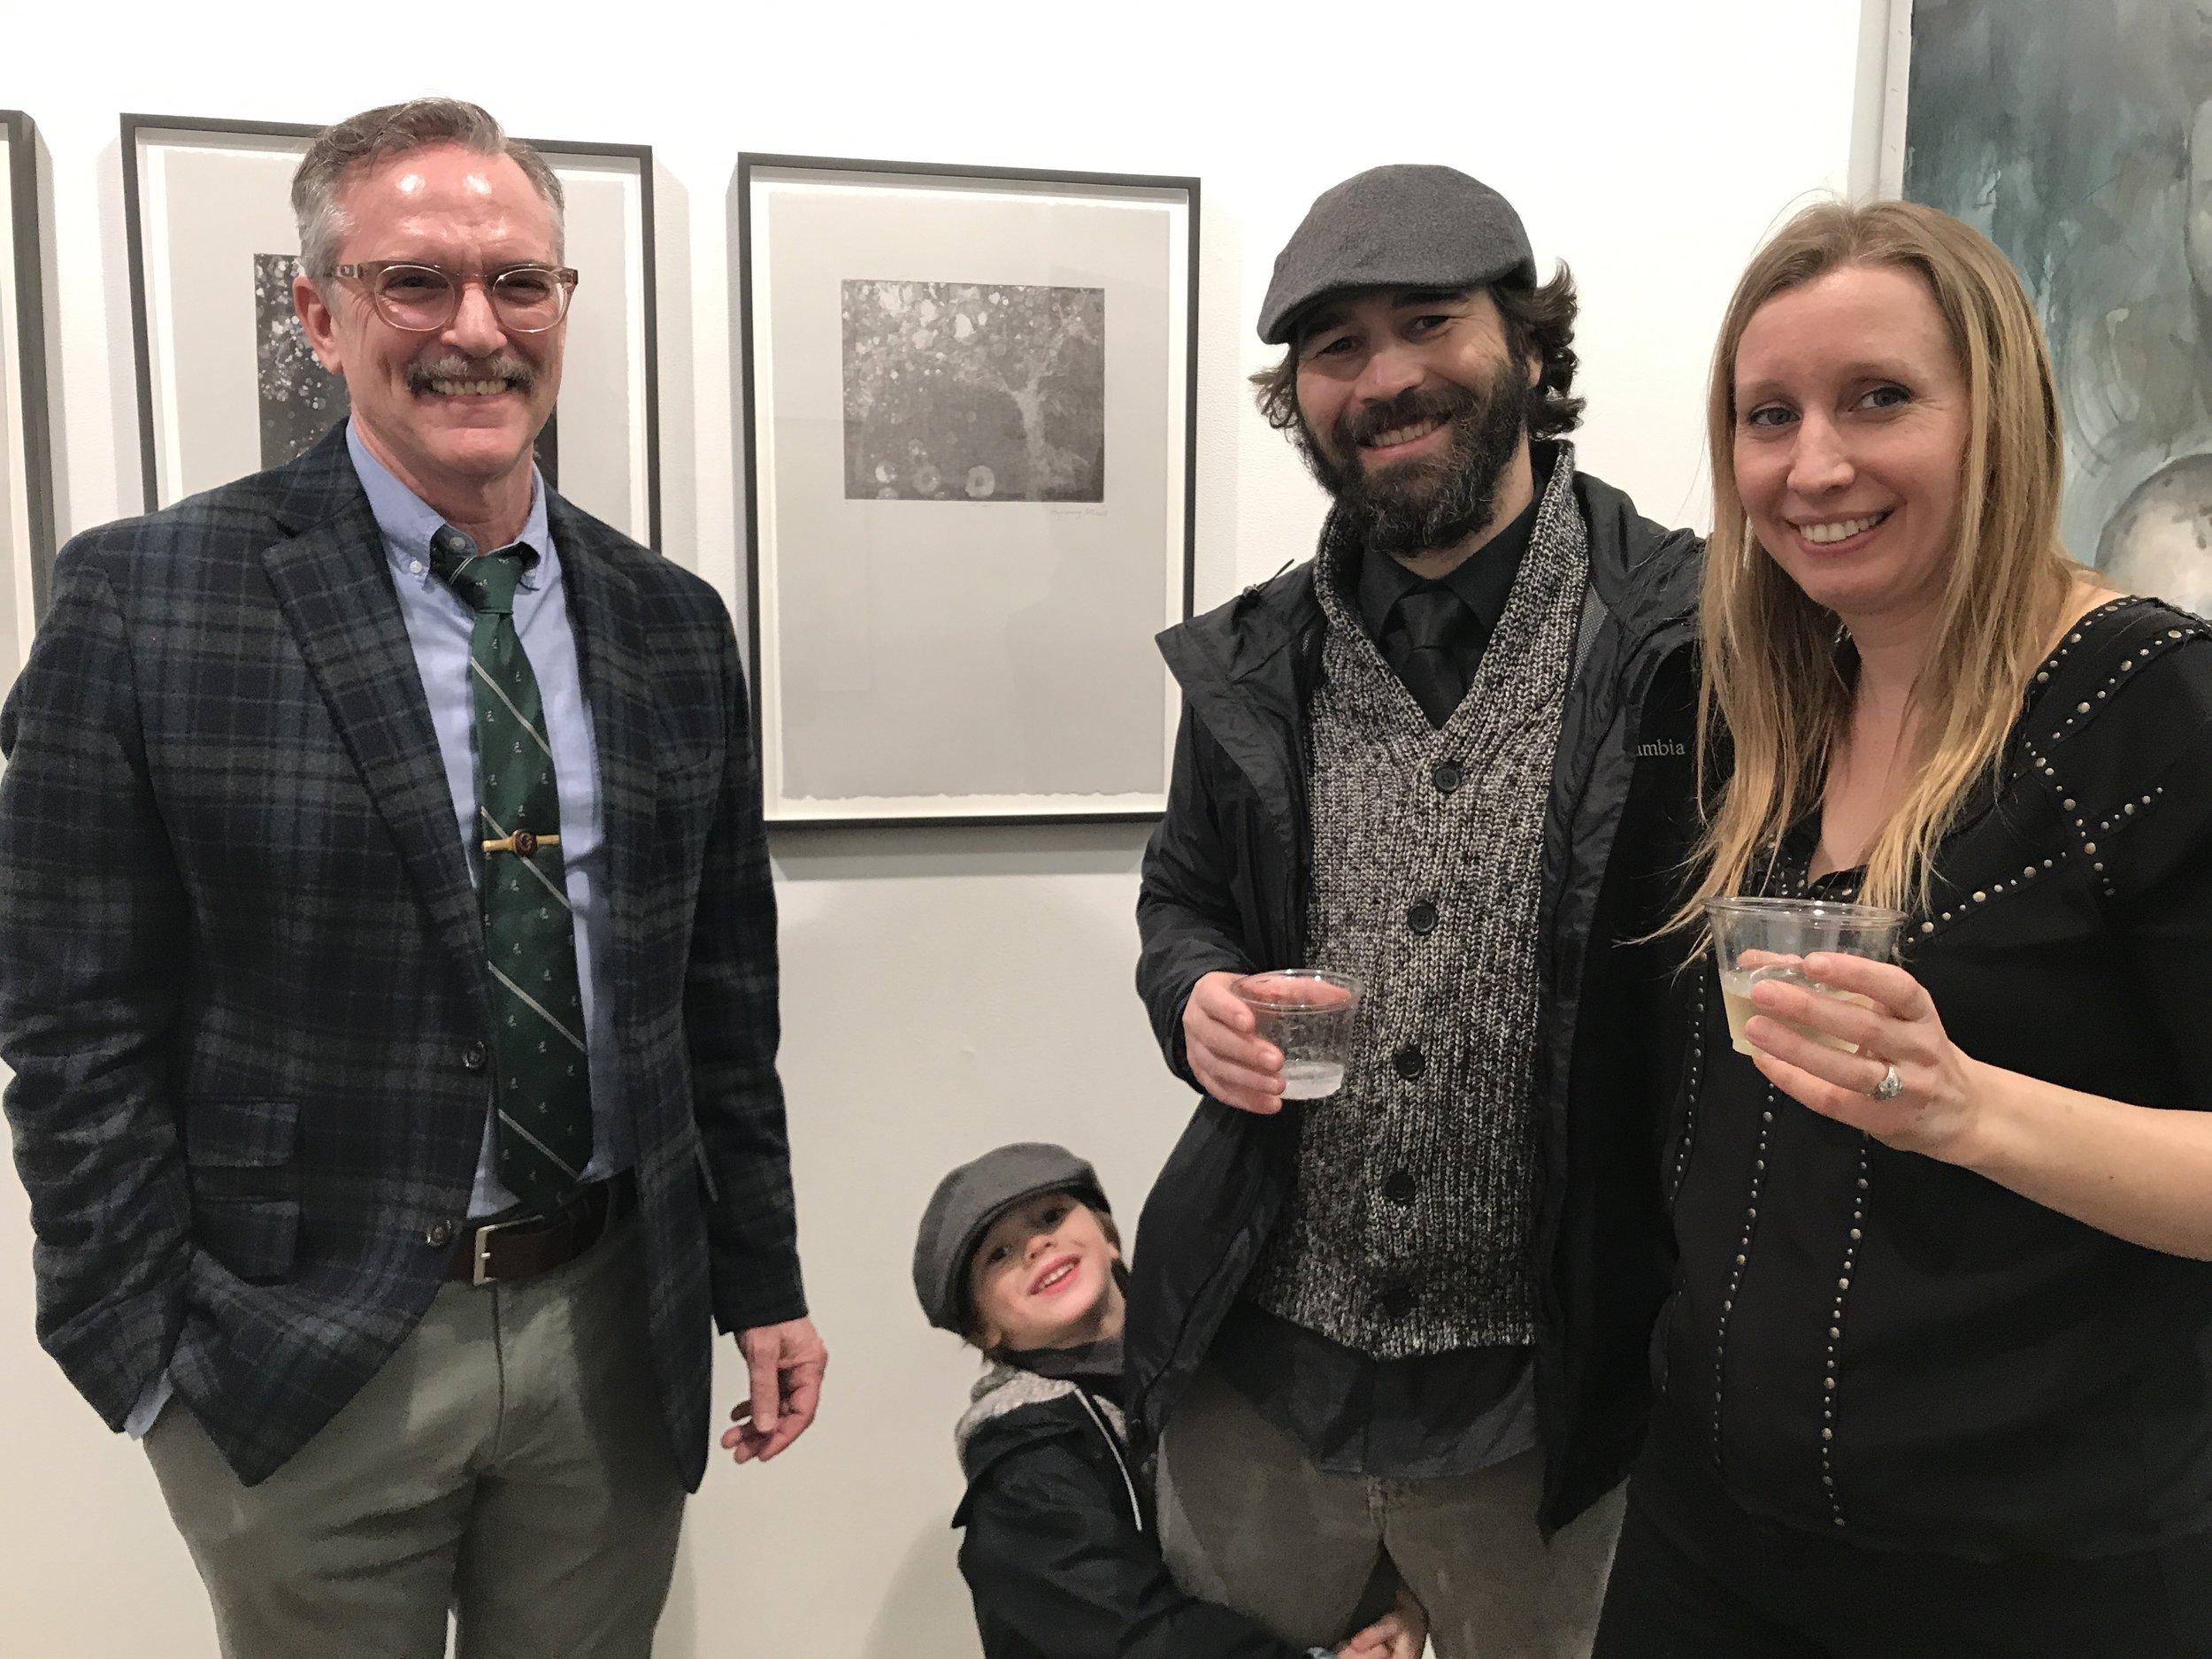 Director Michael Gormley, Greg Mortenson and Junior, and Kristin Kunc